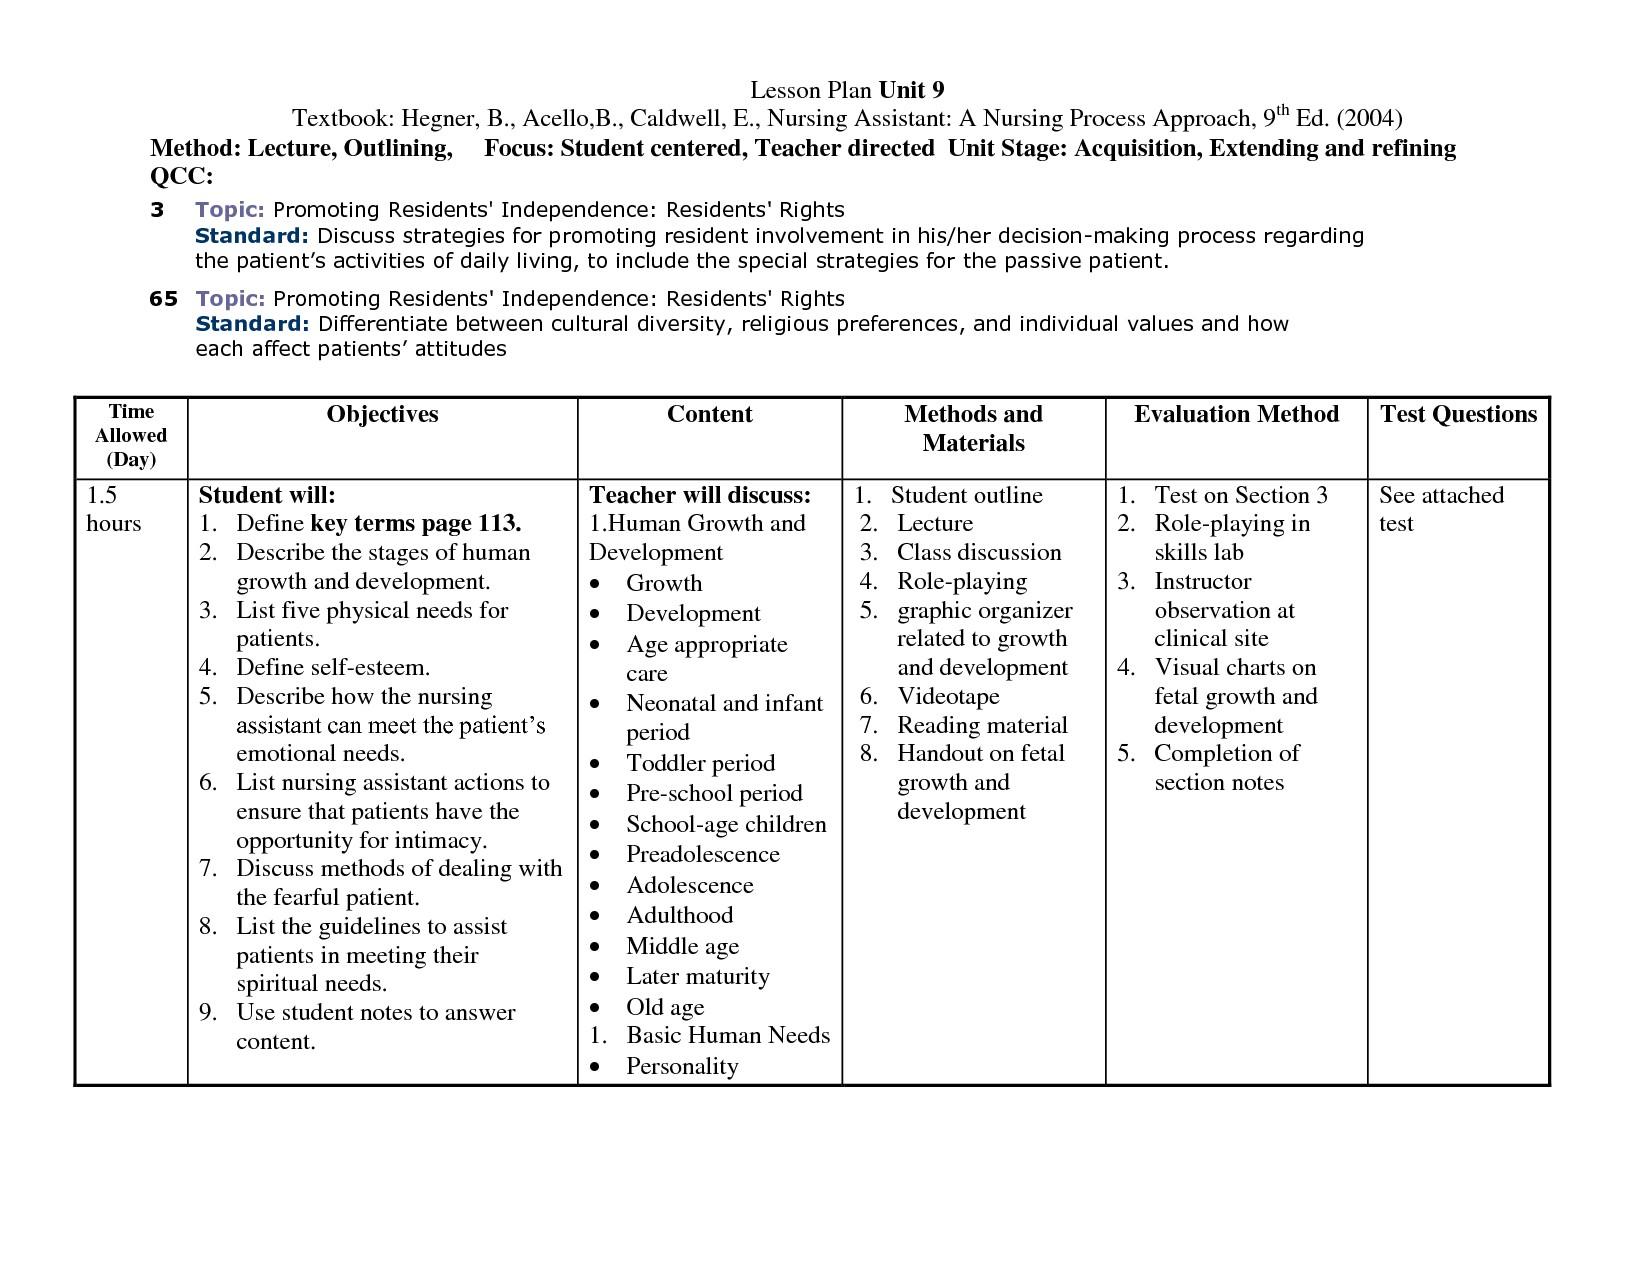 lesson plan template nursing education  Education Plan Template For Nurses – printable schedule ..